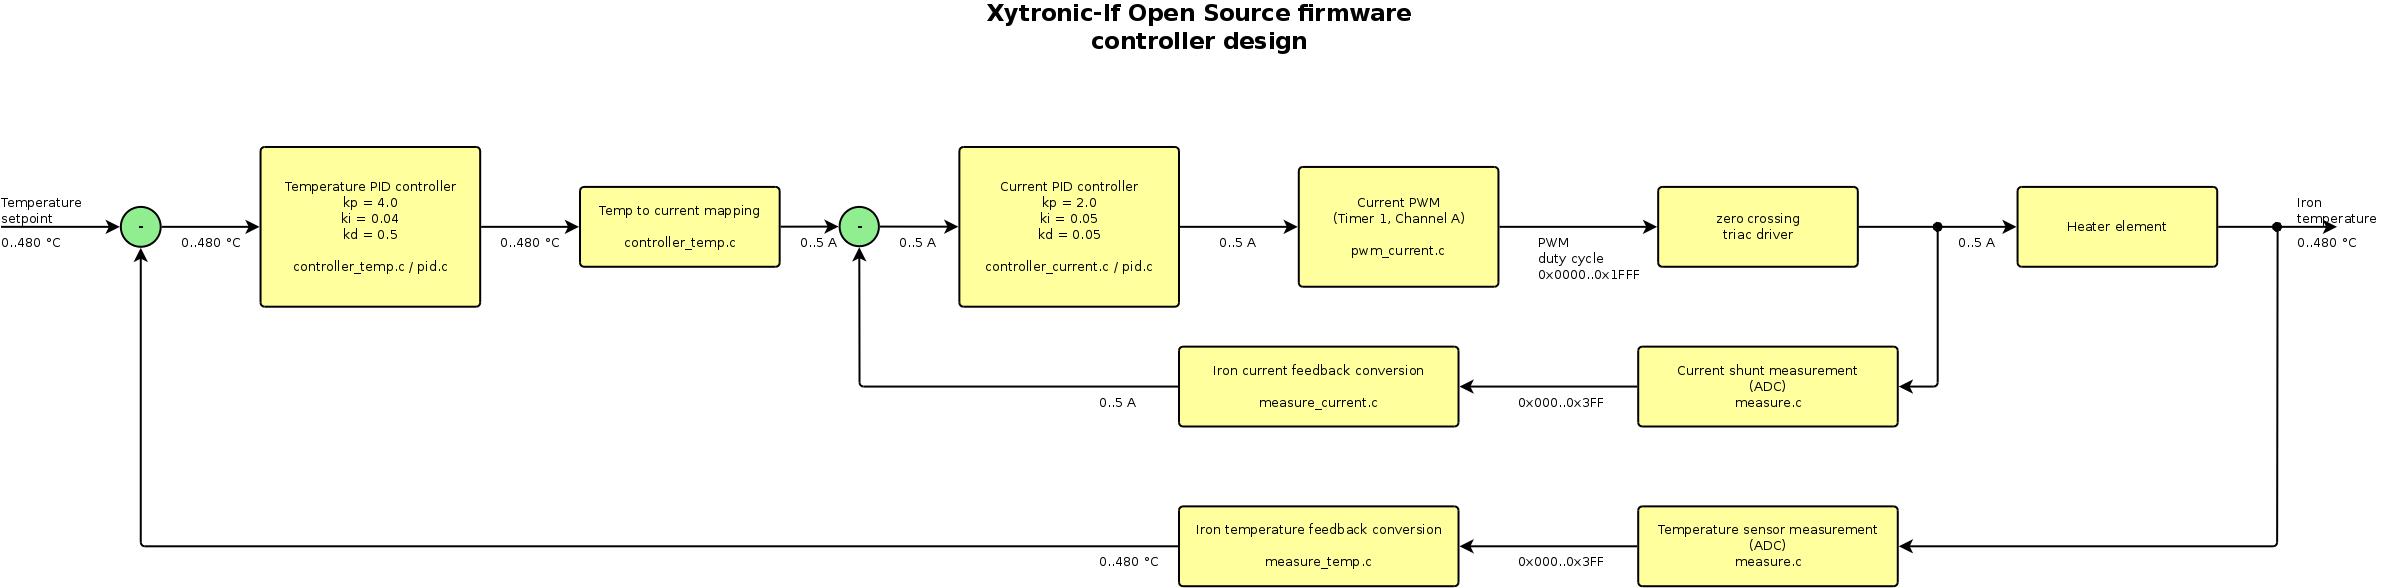 Xytronic Lf 1600 Open Source Firmware Circuit Diagram Nokia Image Preview Of Controller